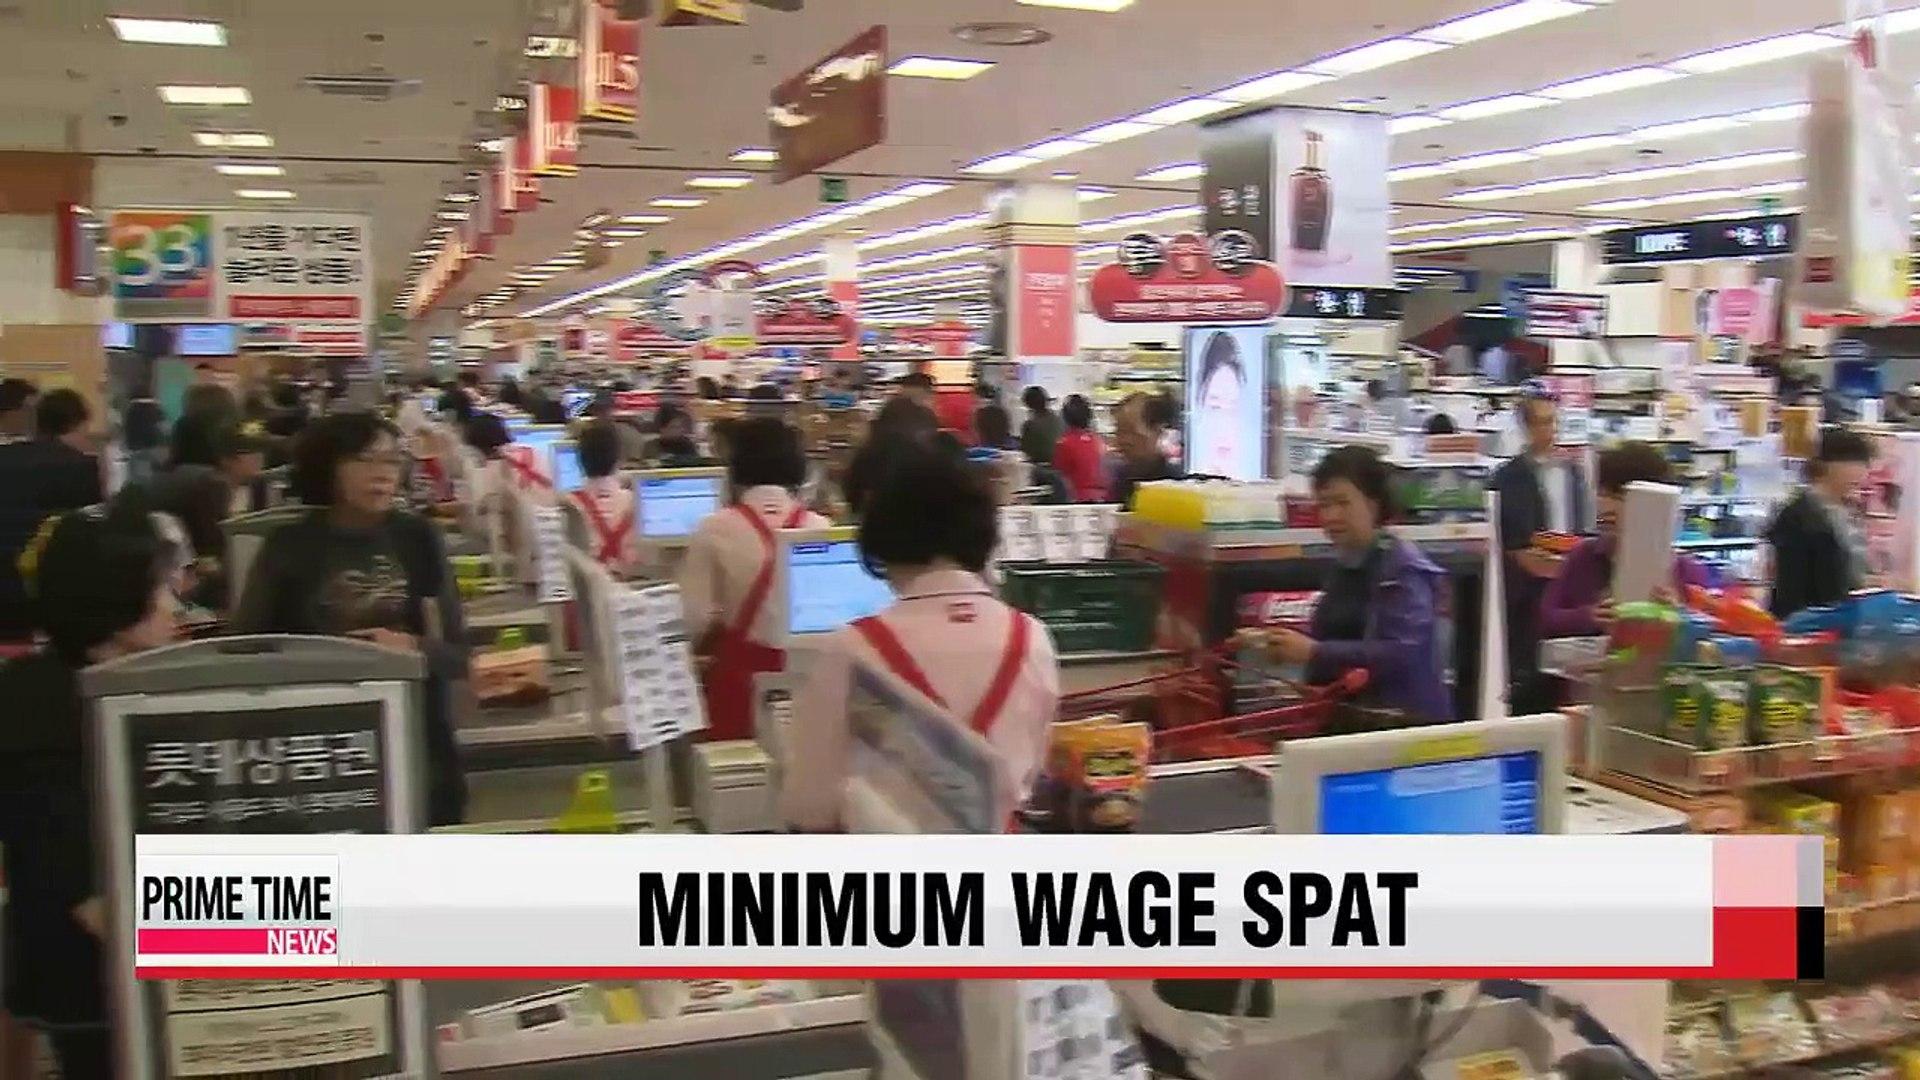 Korea's minimum wage for 2016 set at 6,030 won (US$5.30)